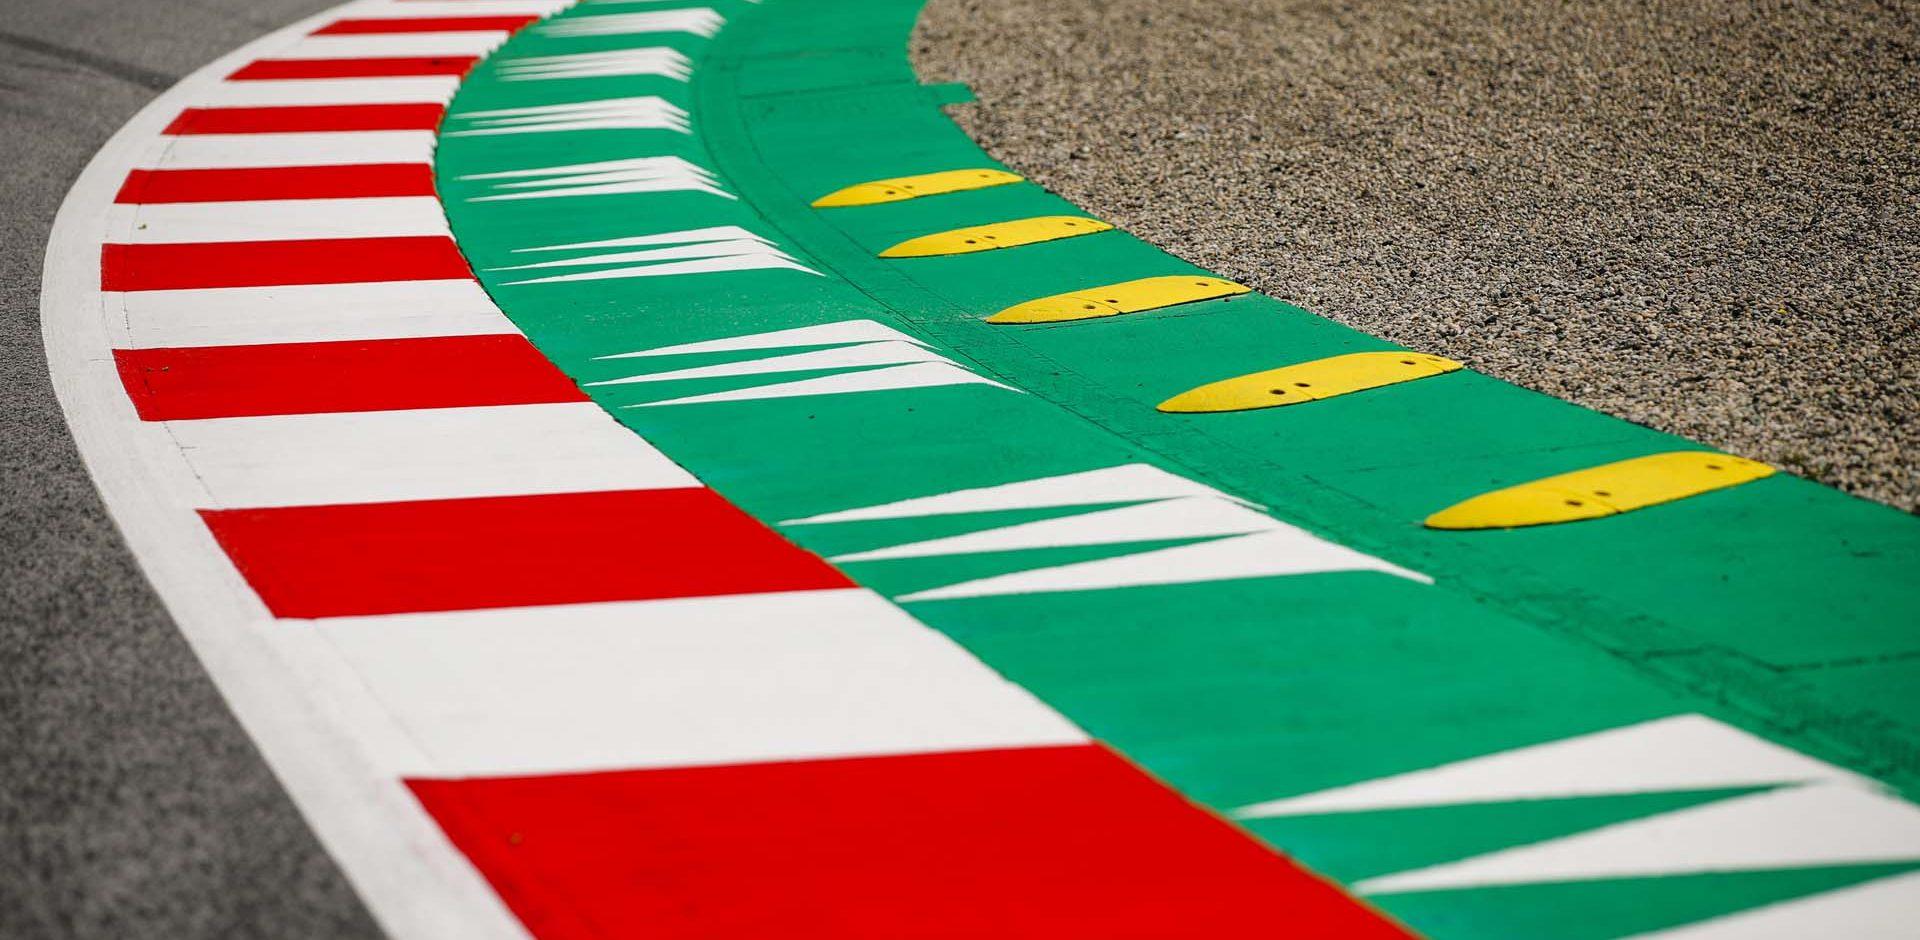 Track kerb details during the Formula 1 Rolex Grosser Preis von Osterreich 2020, Austrian Grand Prix from July 02 to 05, 2020 on the Red Bull Ring, in Spielberg, Austria - Photo Florent Gooden / DPPI